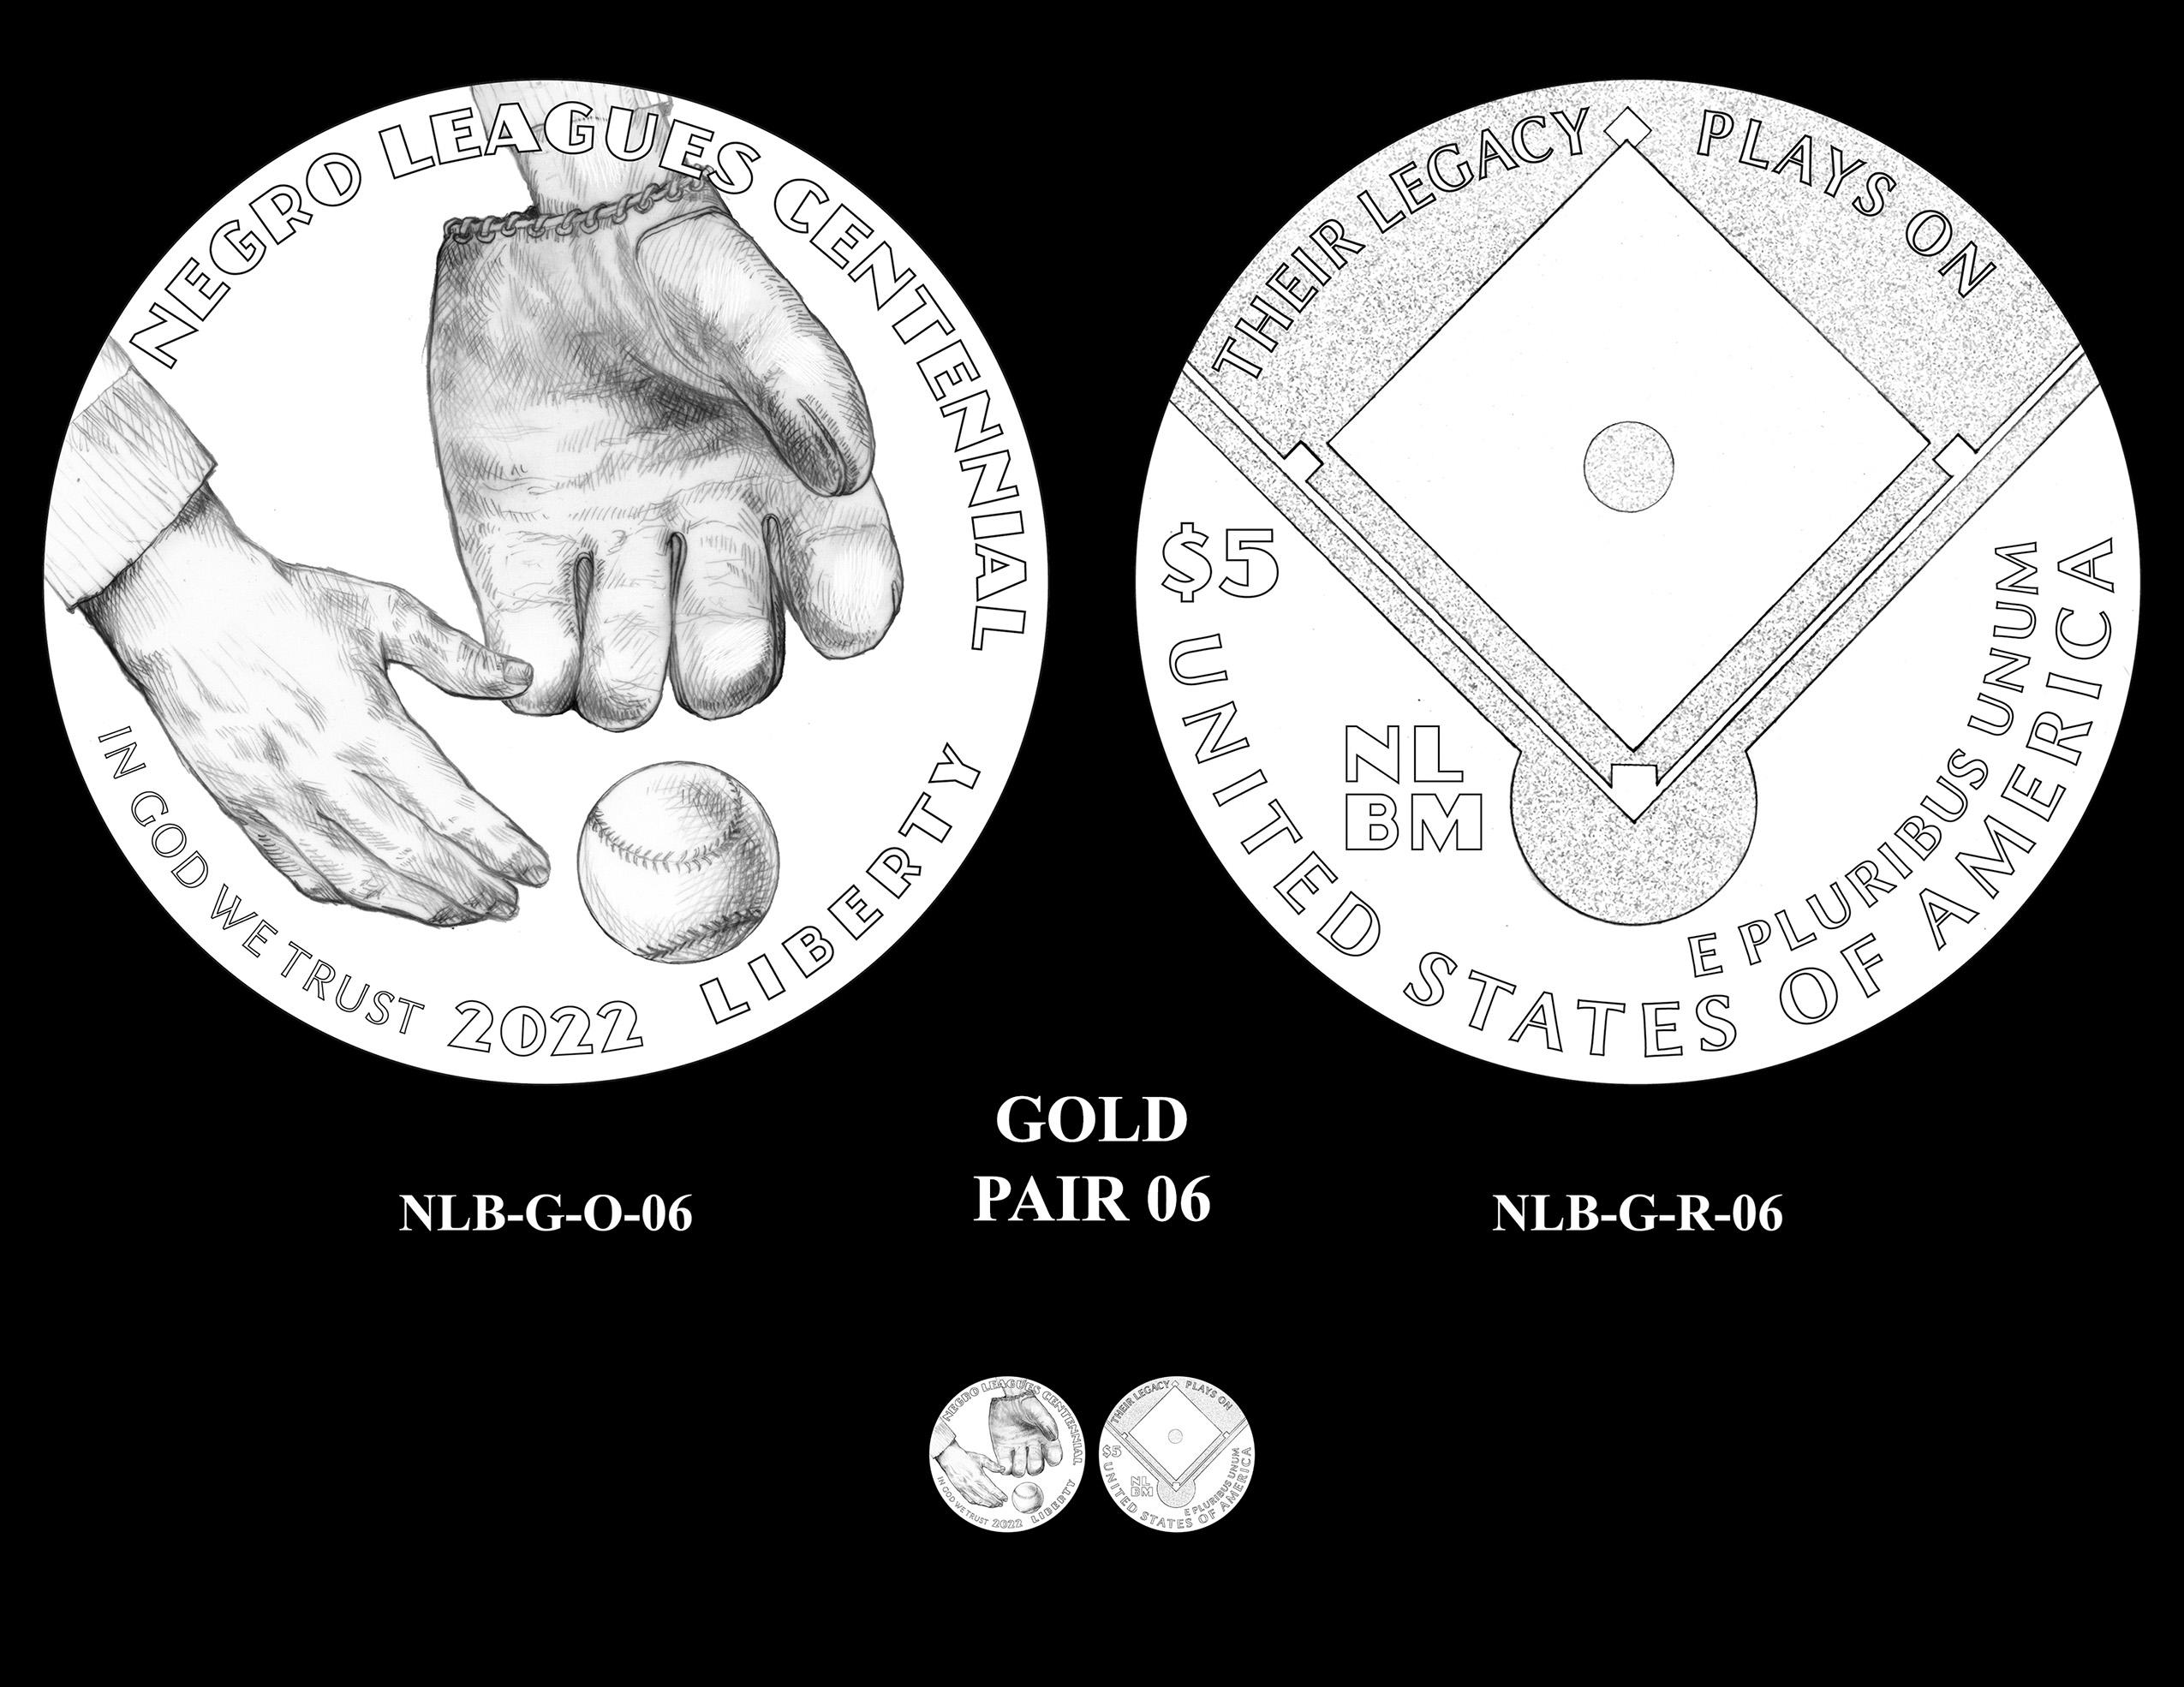 Gold Pair 06 -- Negro Leagues Baseball Commemorative Coin Program